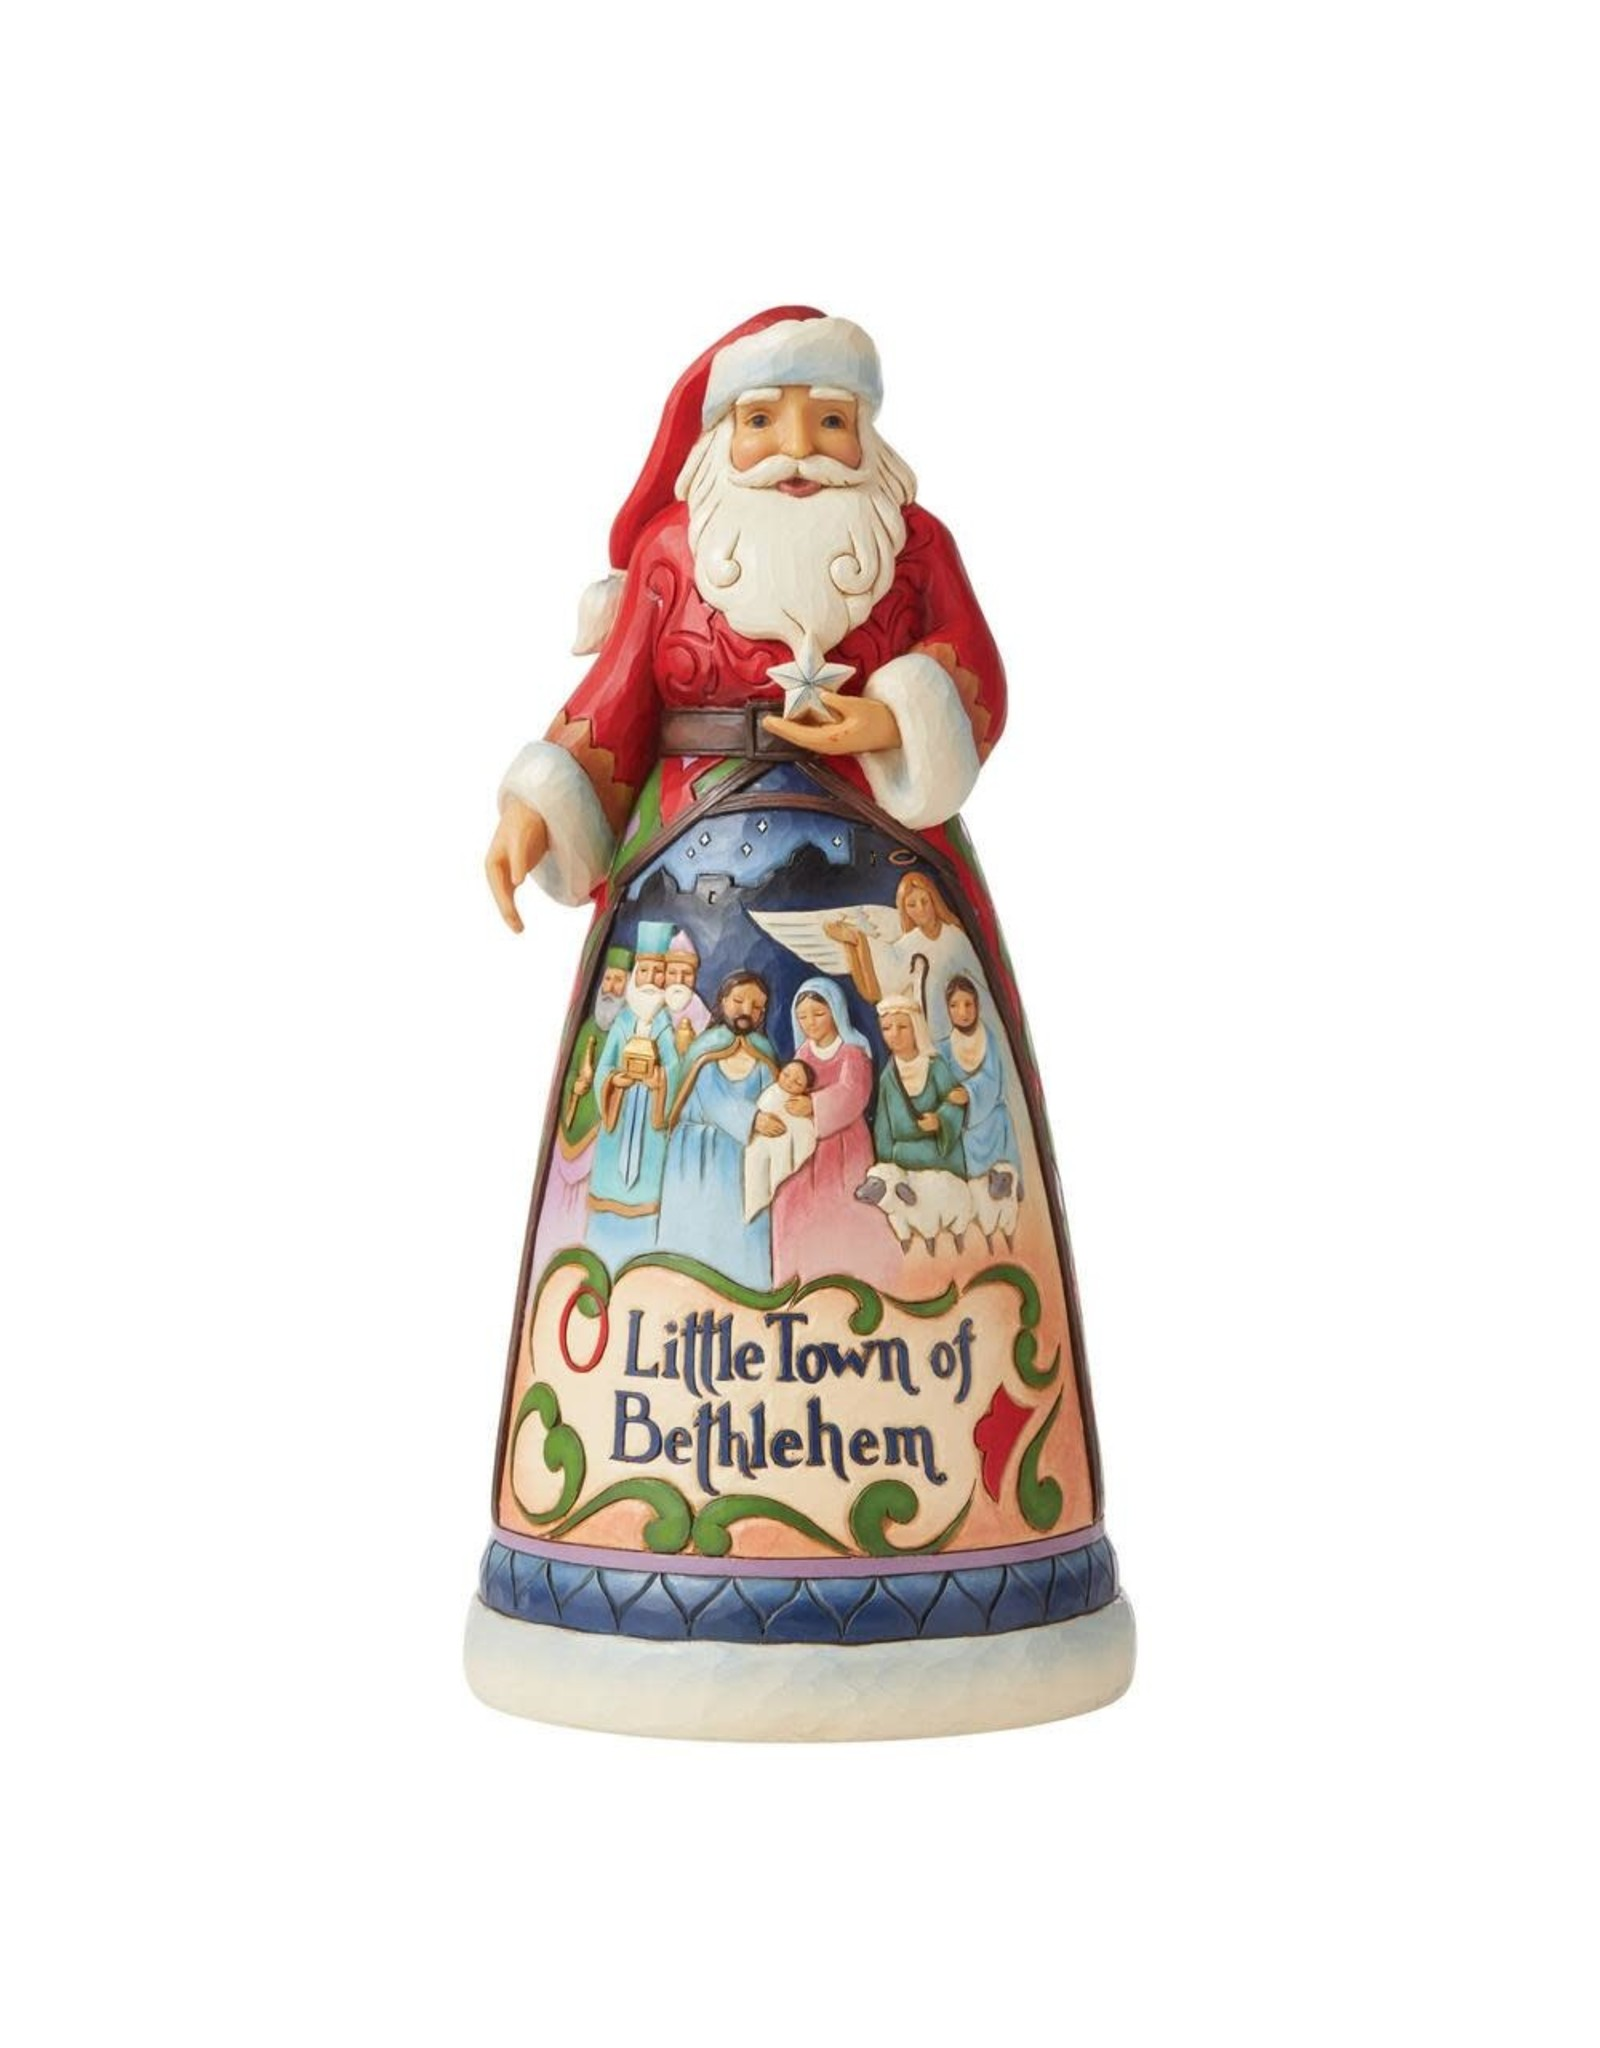 Jim Shore O Little Town of Bethlehem Santa